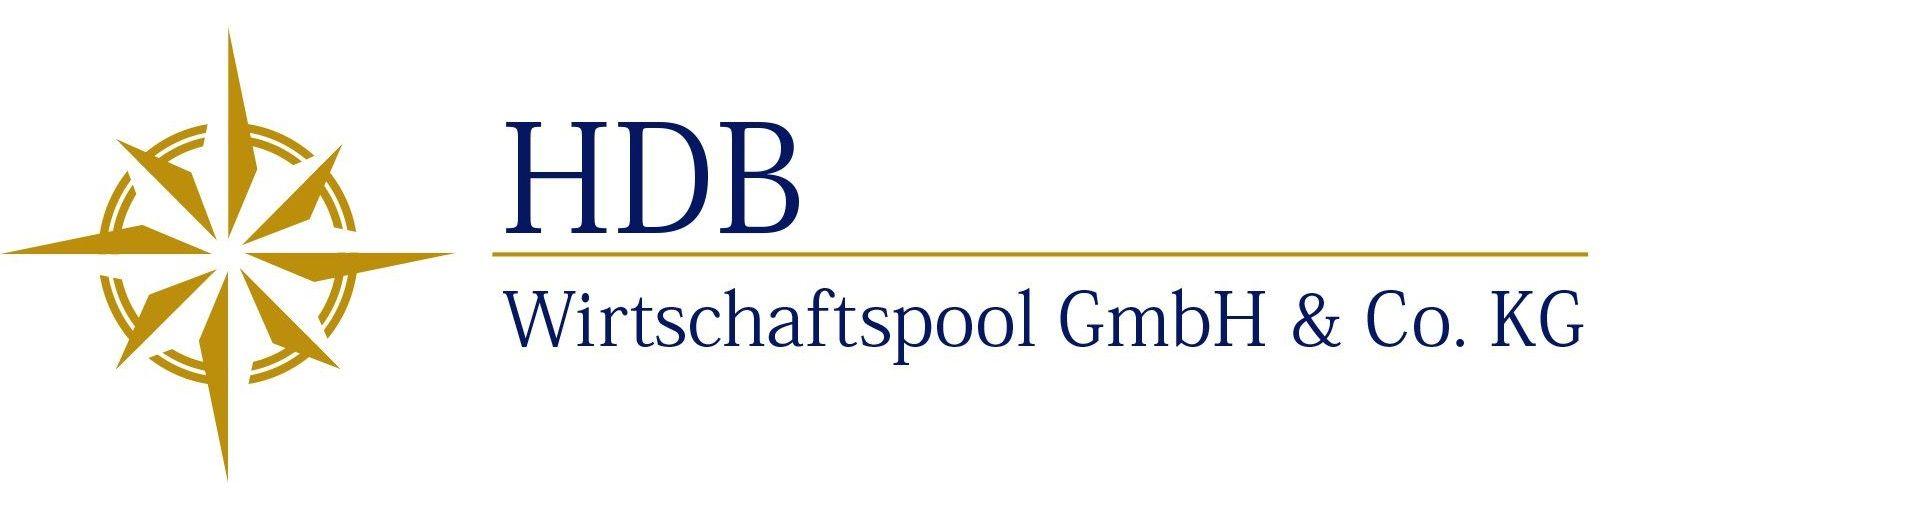 hdb-wirtschaftspool.de-Logo